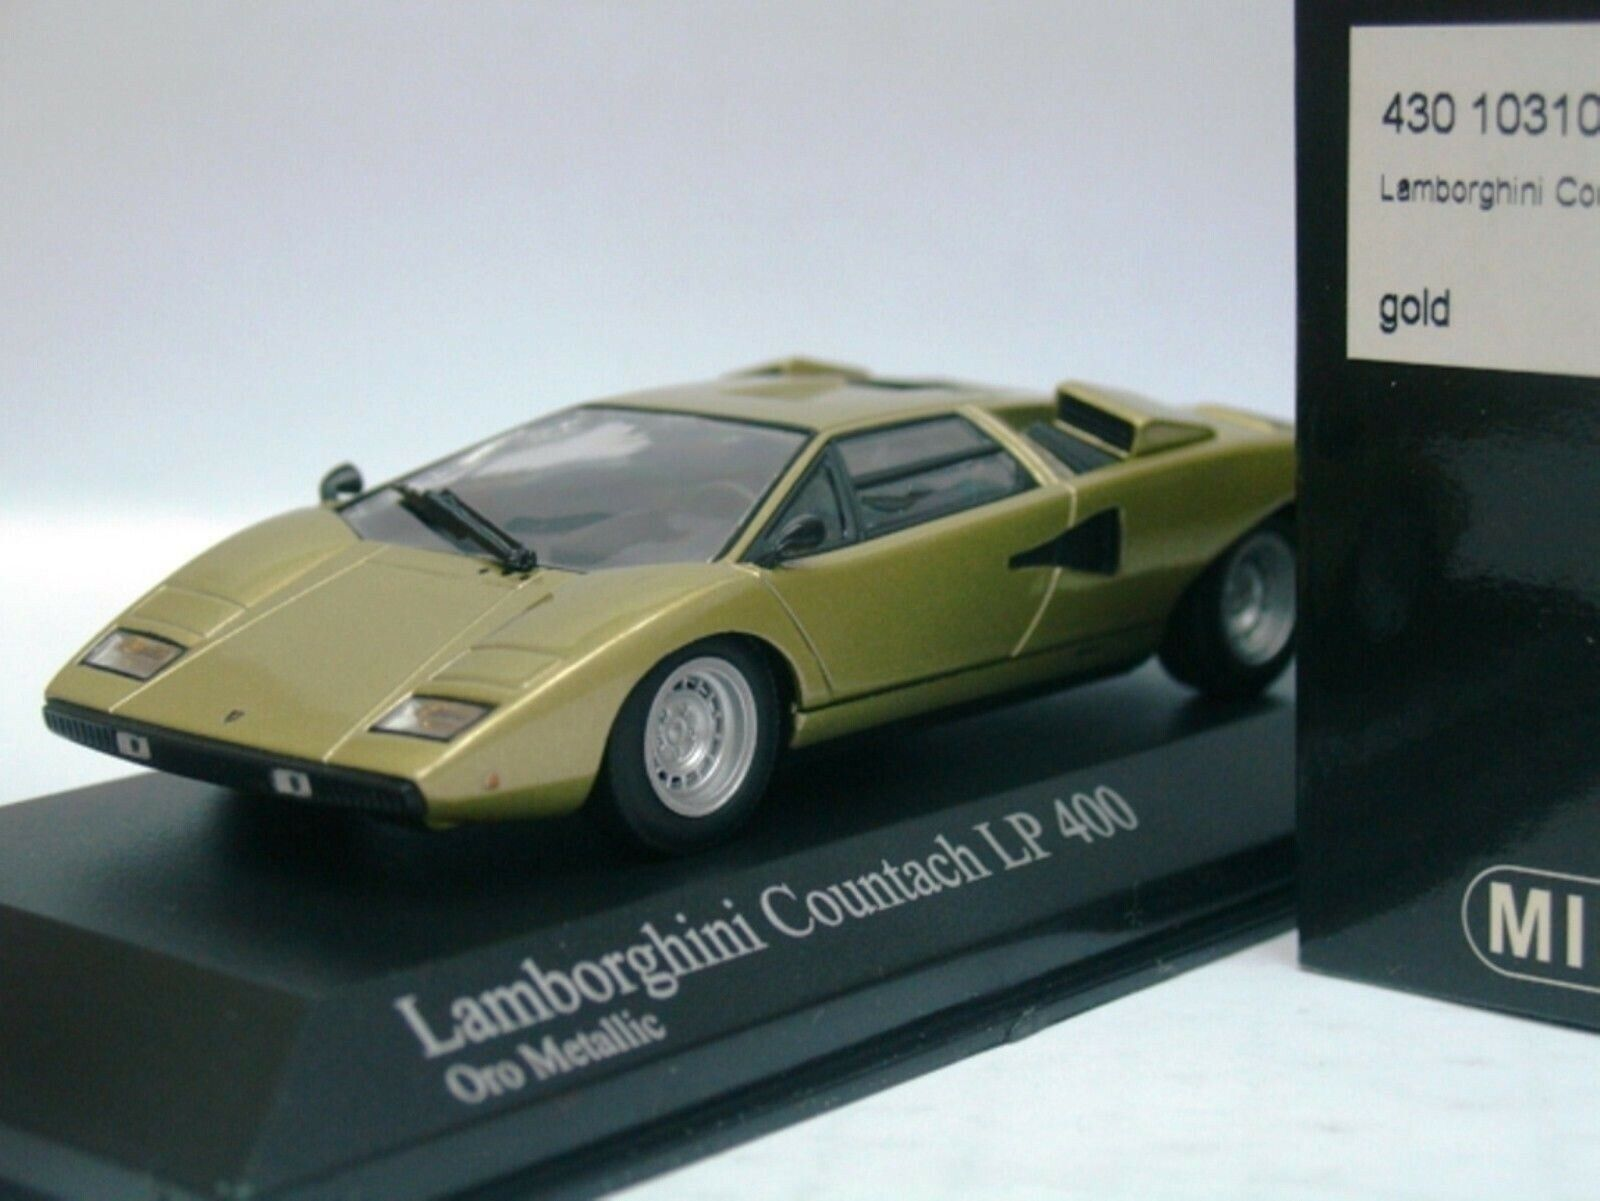 WOW EXTREMELY RARE Lamborghini Countach LP400 1974 gold m 1 43 Minichamps-Espada